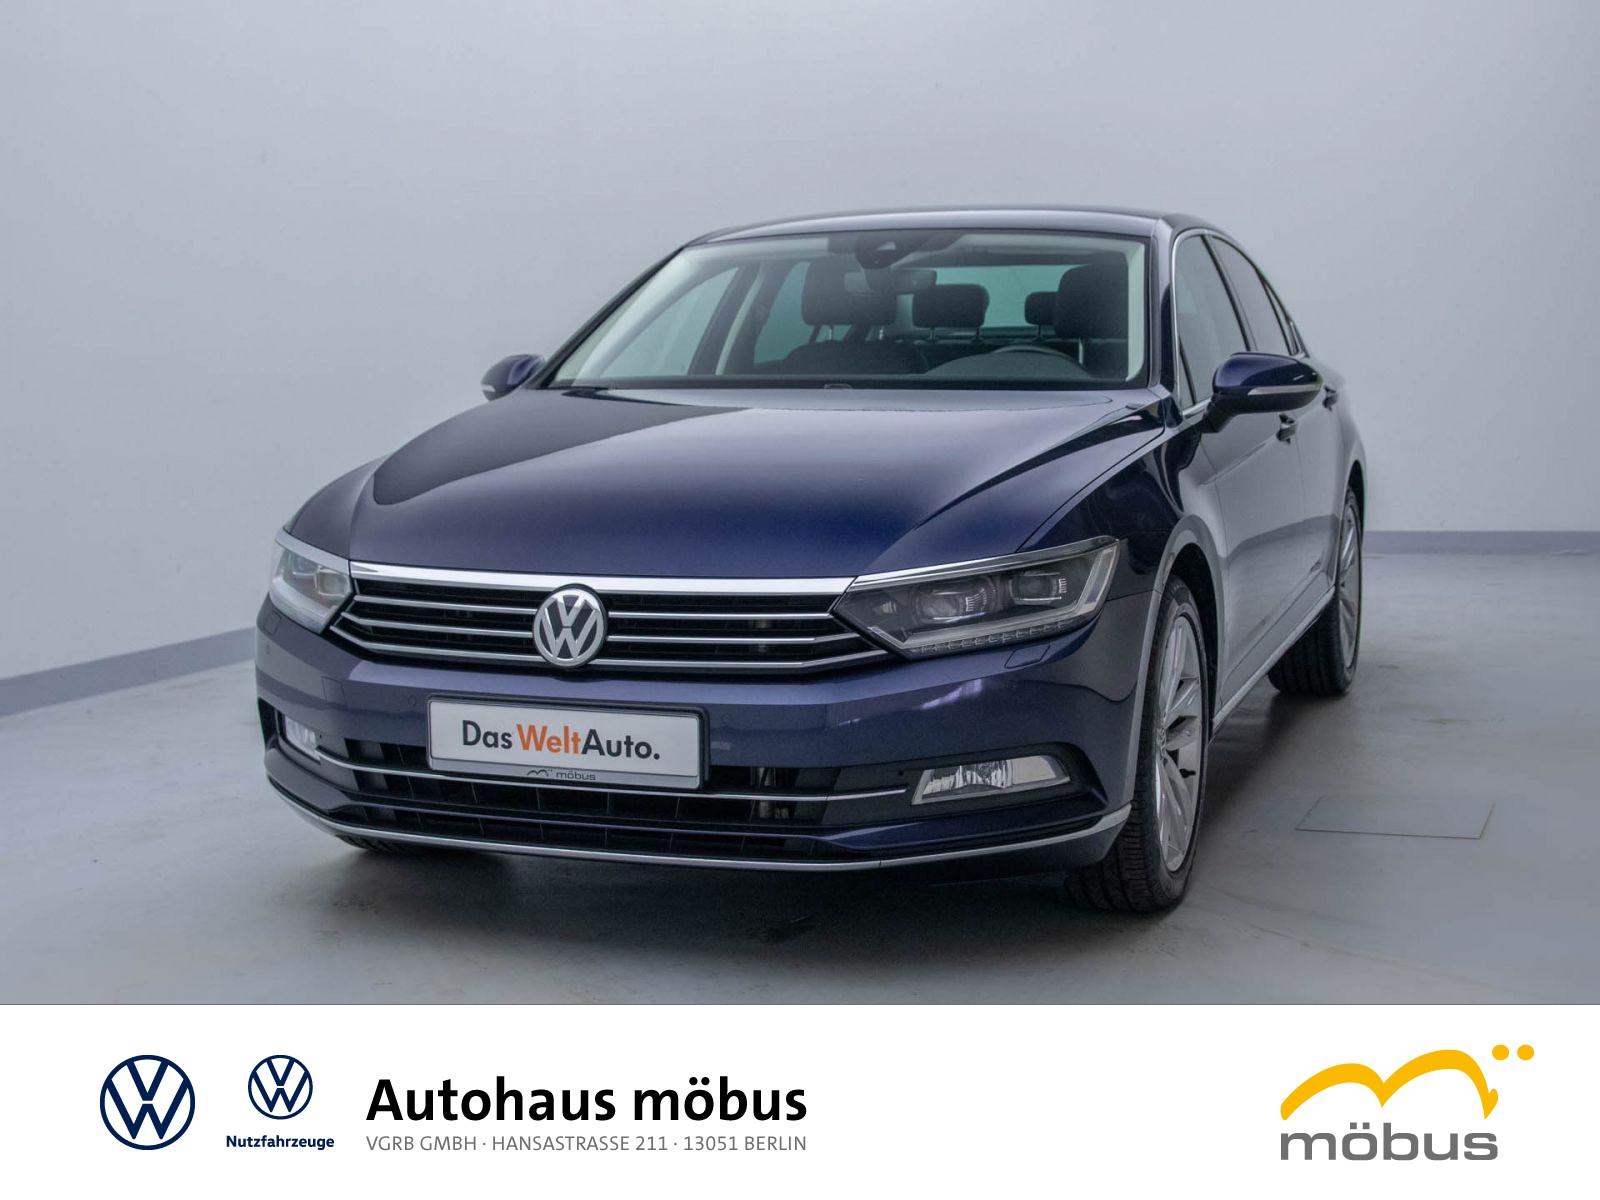 Volkswagen Passat 1.8 TSI DSG**HIGHL*LED*LEDER*ASSIST*AID**, Jahr 2016, Benzin